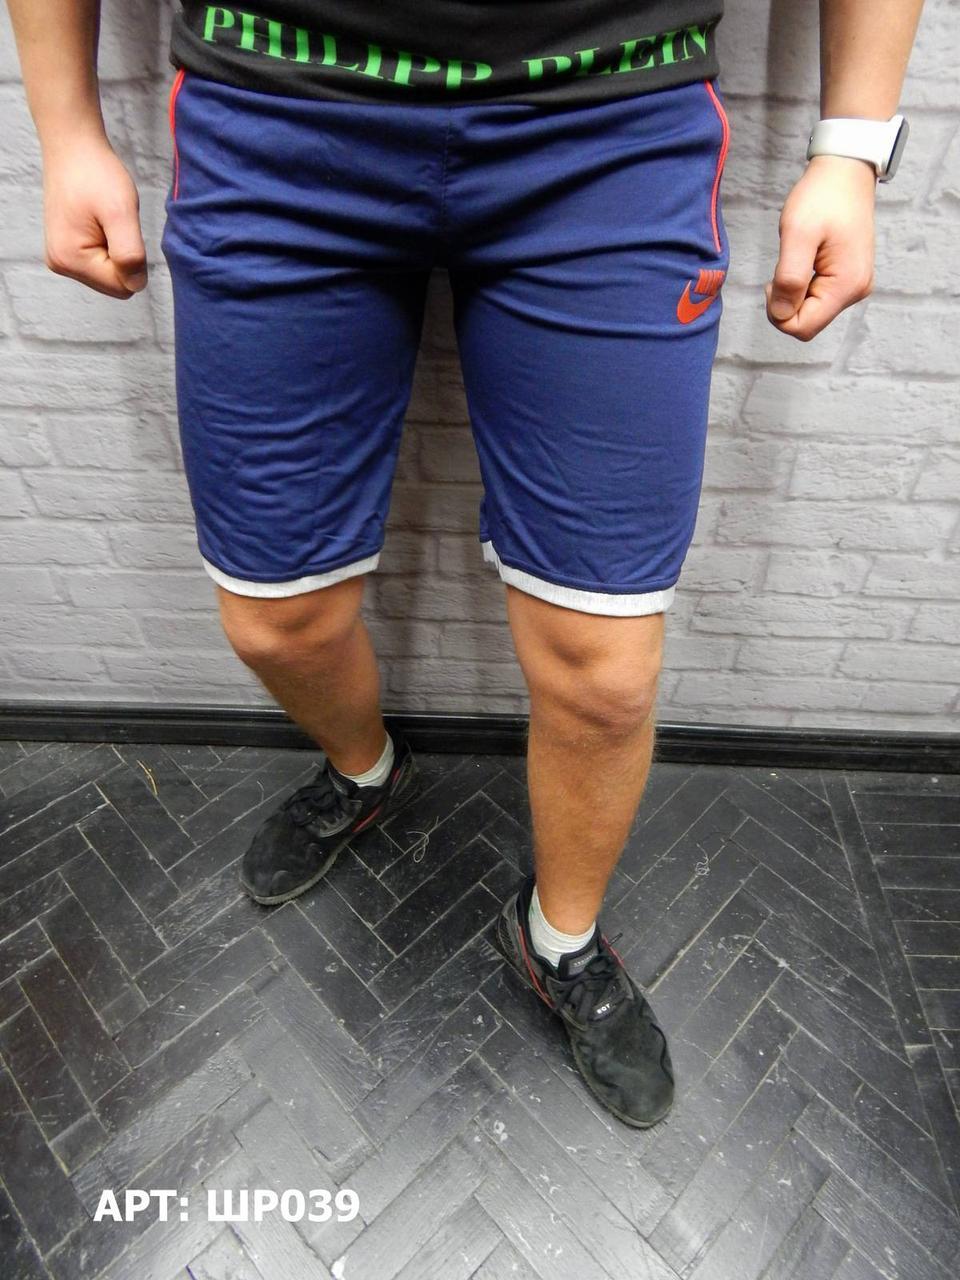 Мужские шорты Nike. Размеры: 46/48/50/52/54